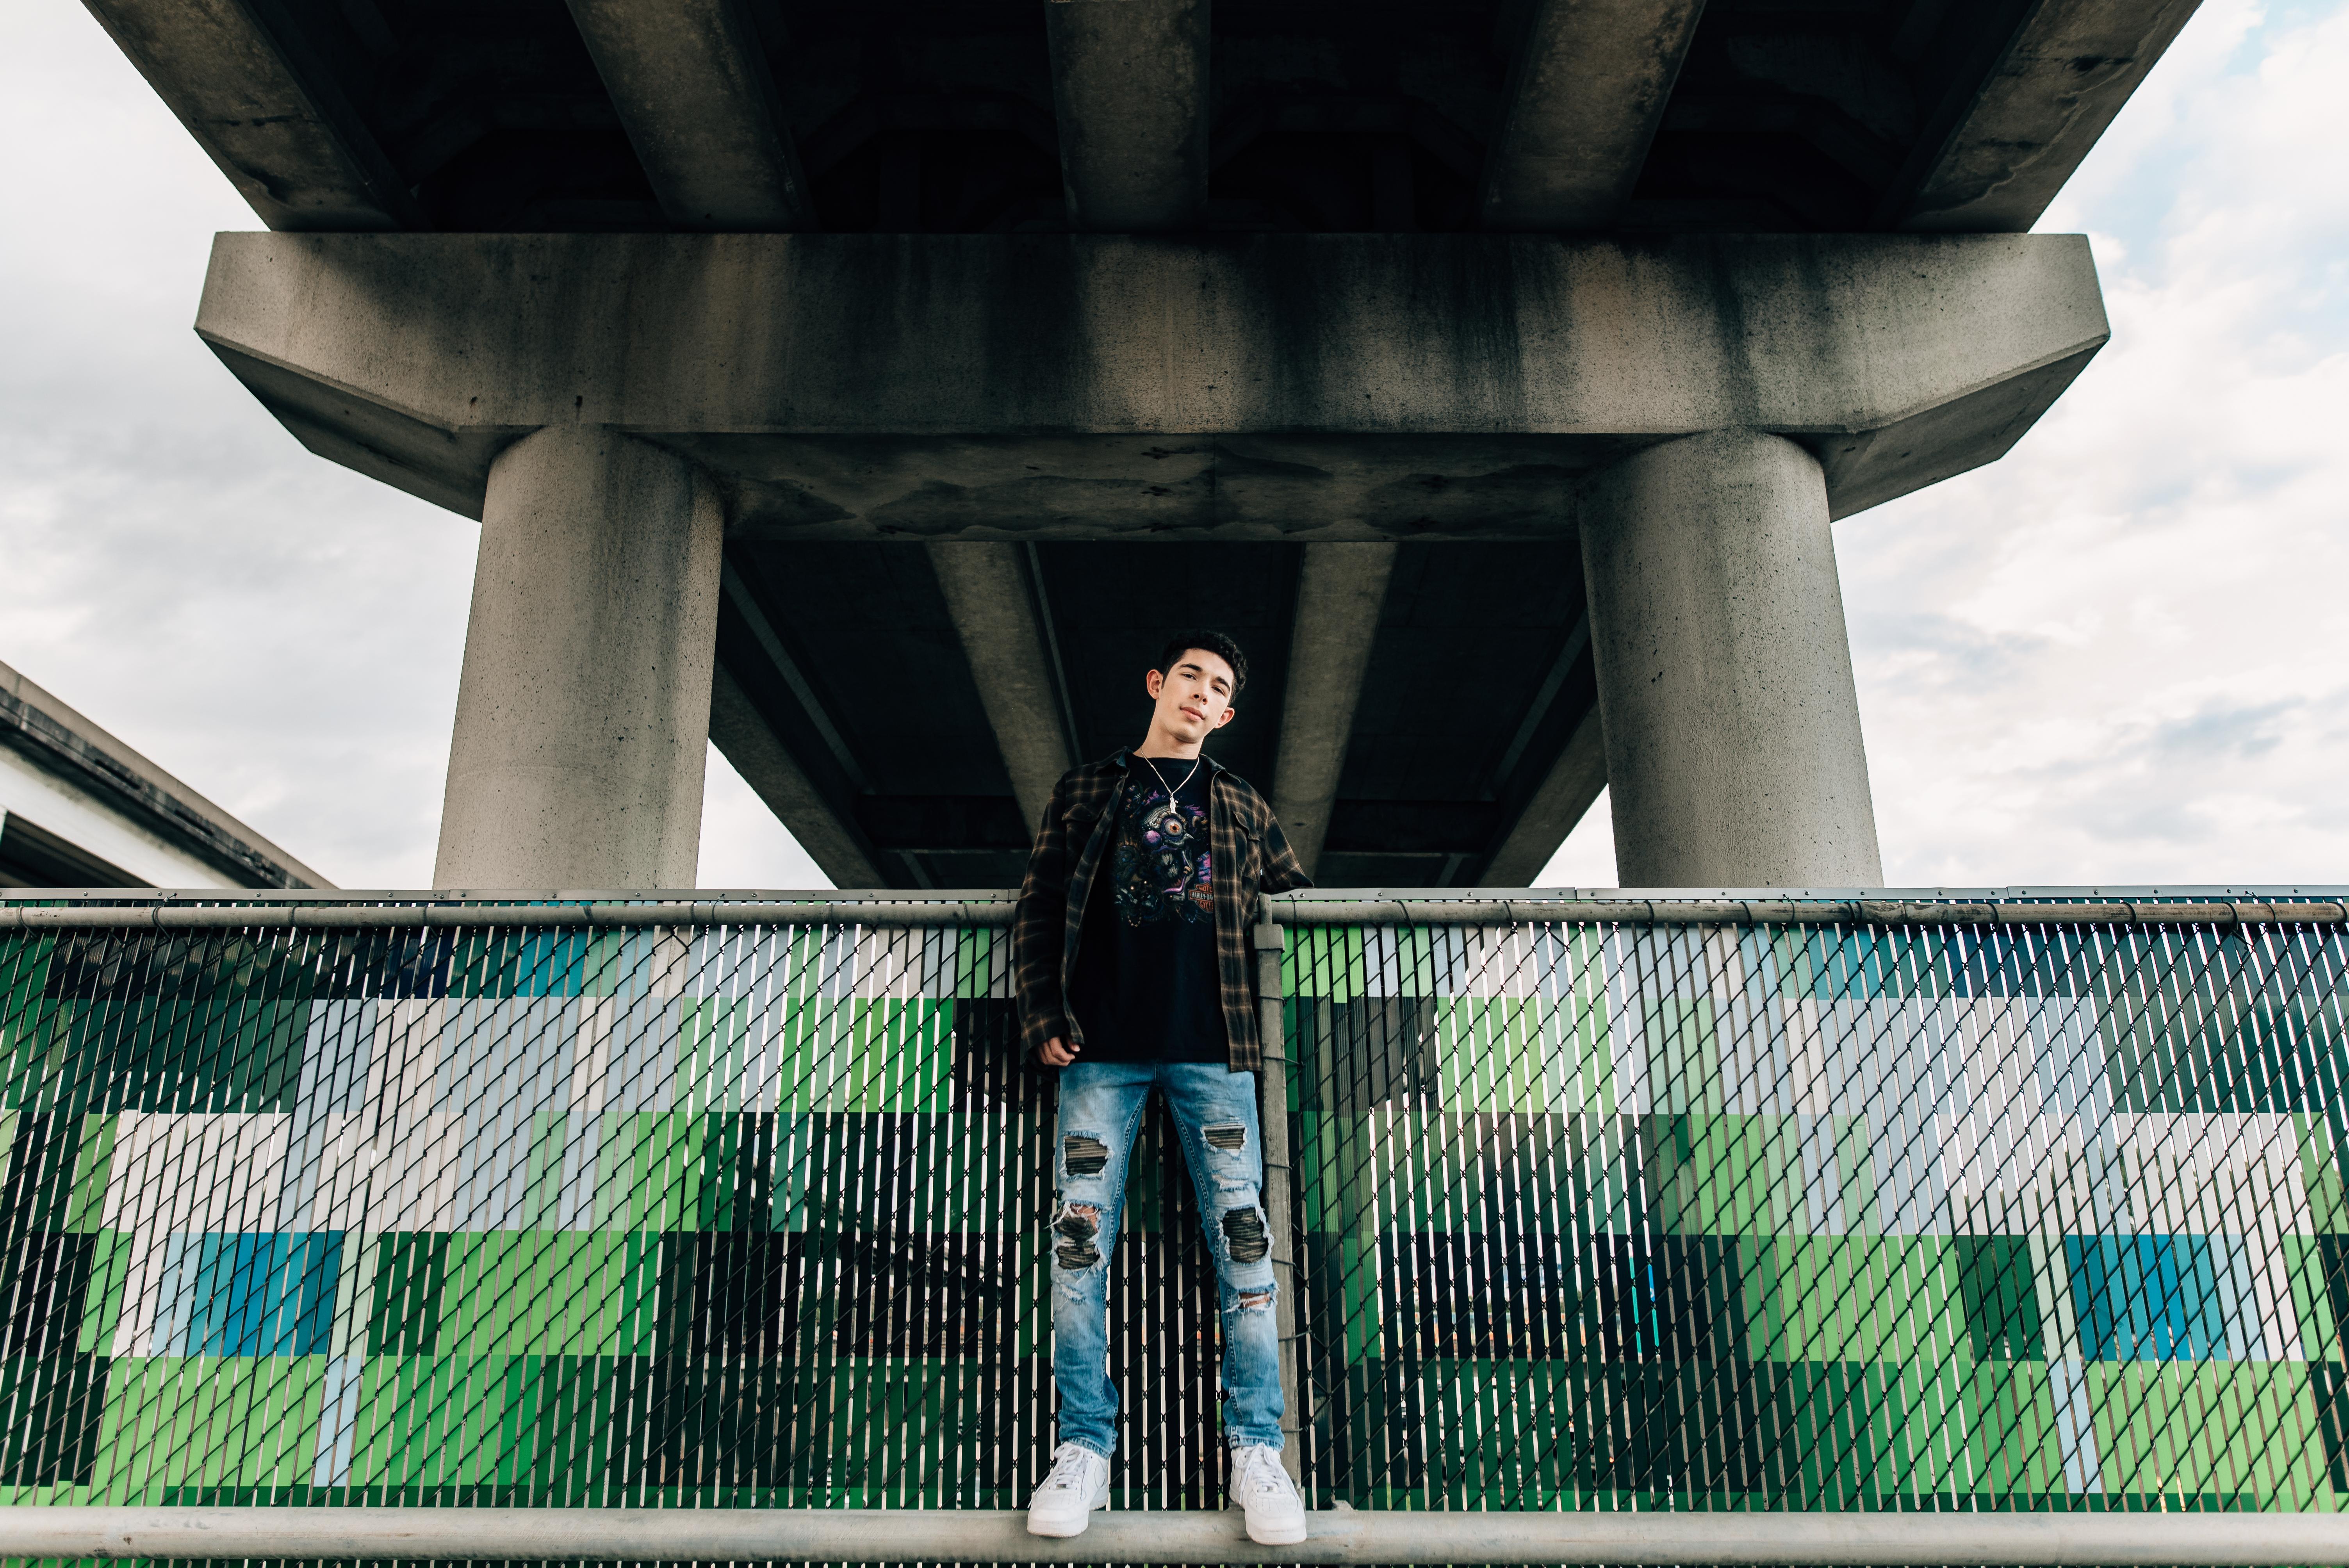 teenage boy standing underneath a bridge overpass